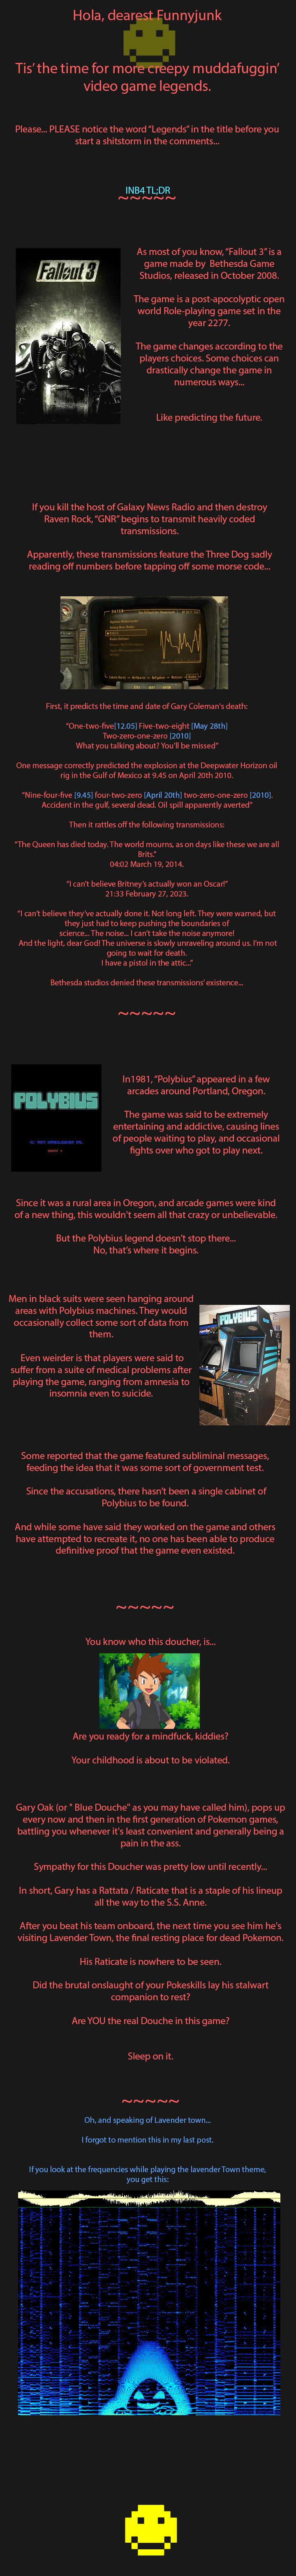 Creepy Game Legends pt 3. Part 1: www.funnyjunk.com/channel/morbid-channel/Creepy+Game+Legends/GjvoGTw/ Part 2: www.funnyjunk.com/channel/morbid-channel/Creepy+